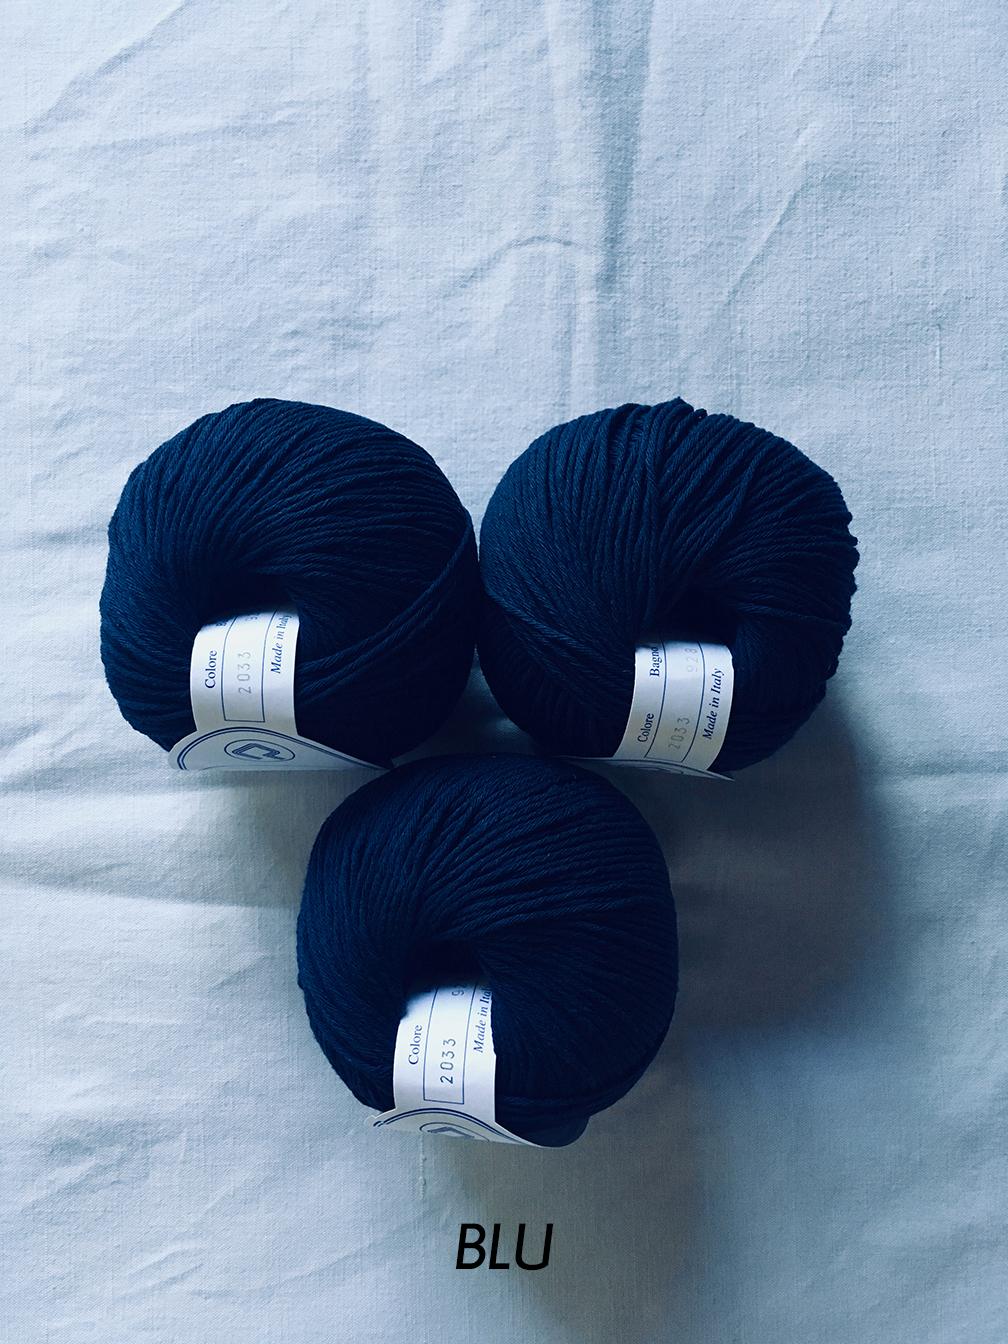 campolmi_cotone_blu_2033_wool_done_knitting.jpg